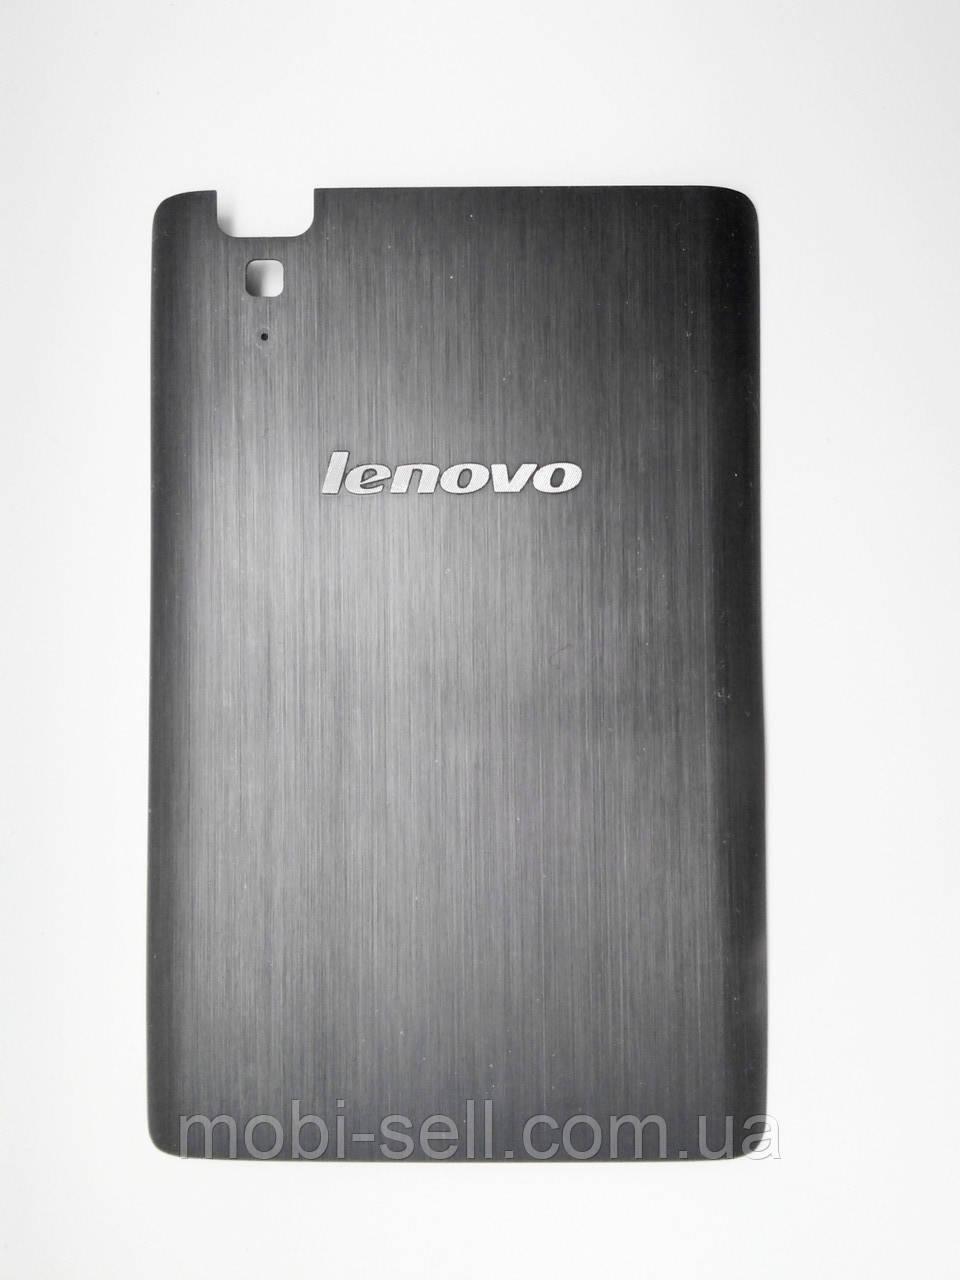 Lenovo P780 задняя крышка аккумулятора, панель (Б/У, оригинал, разборка)